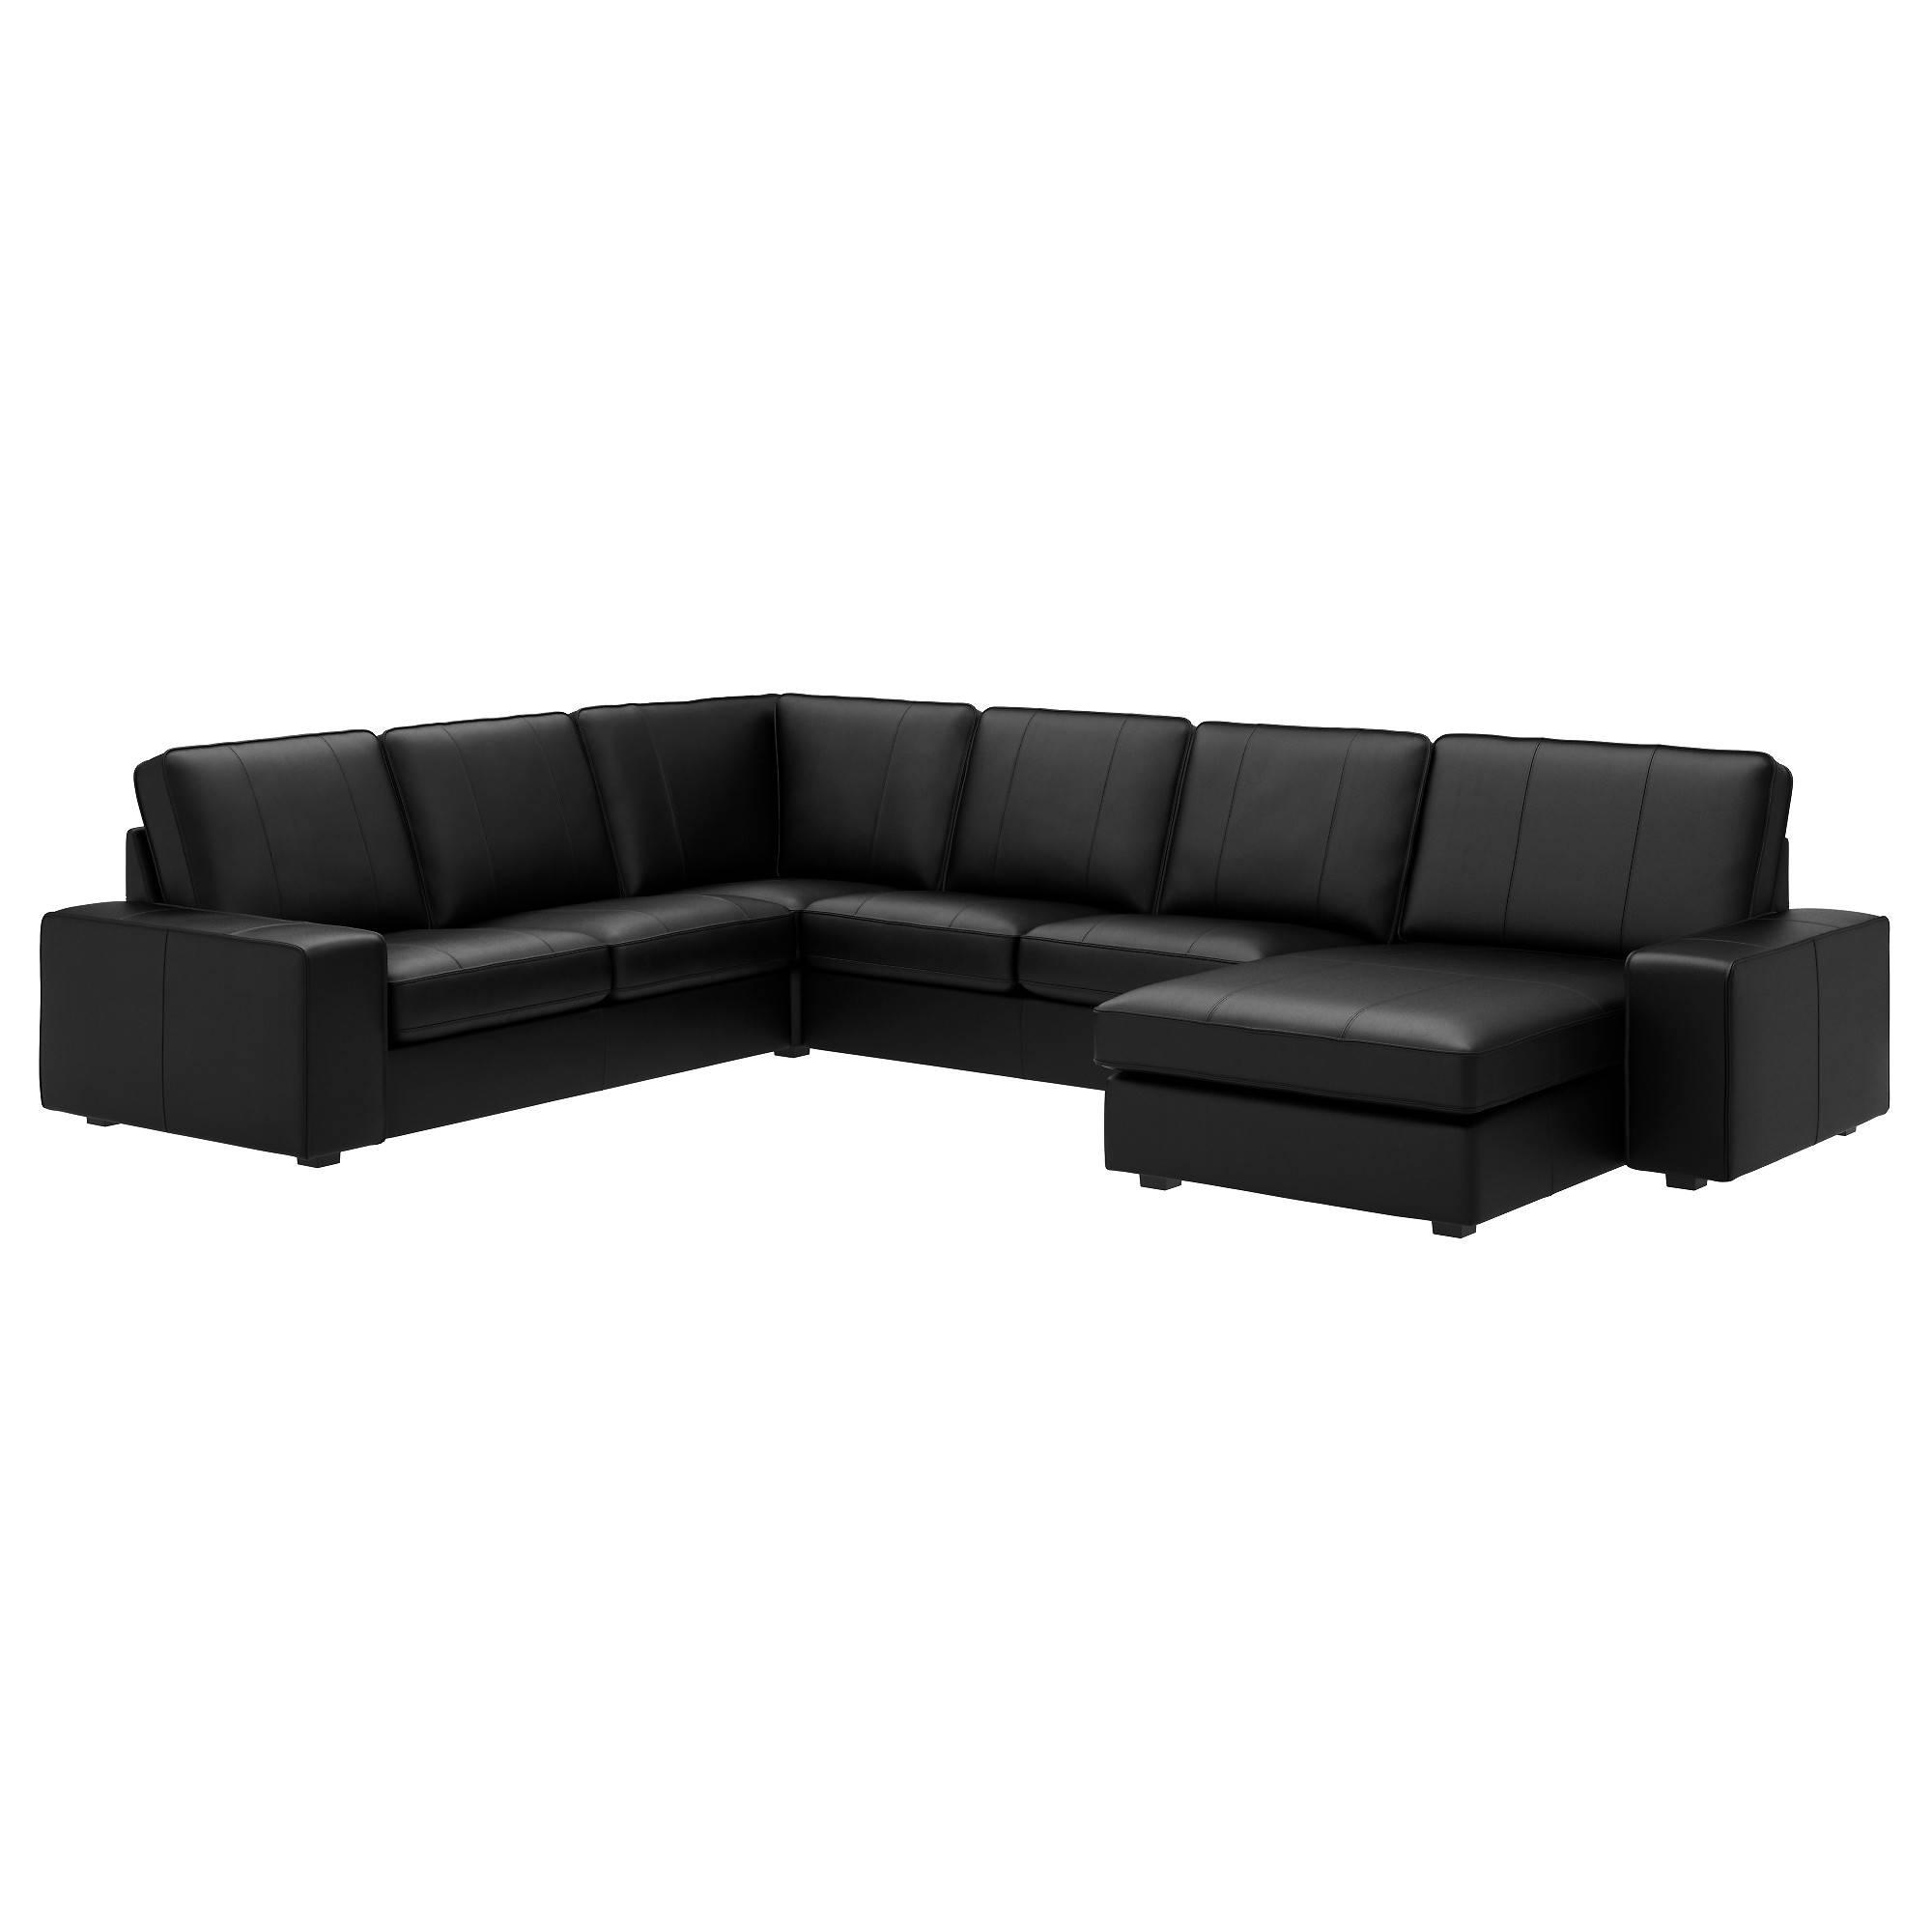 Corner Sofas | Ikea for Small Sofas Ikea (Image 4 of 30)